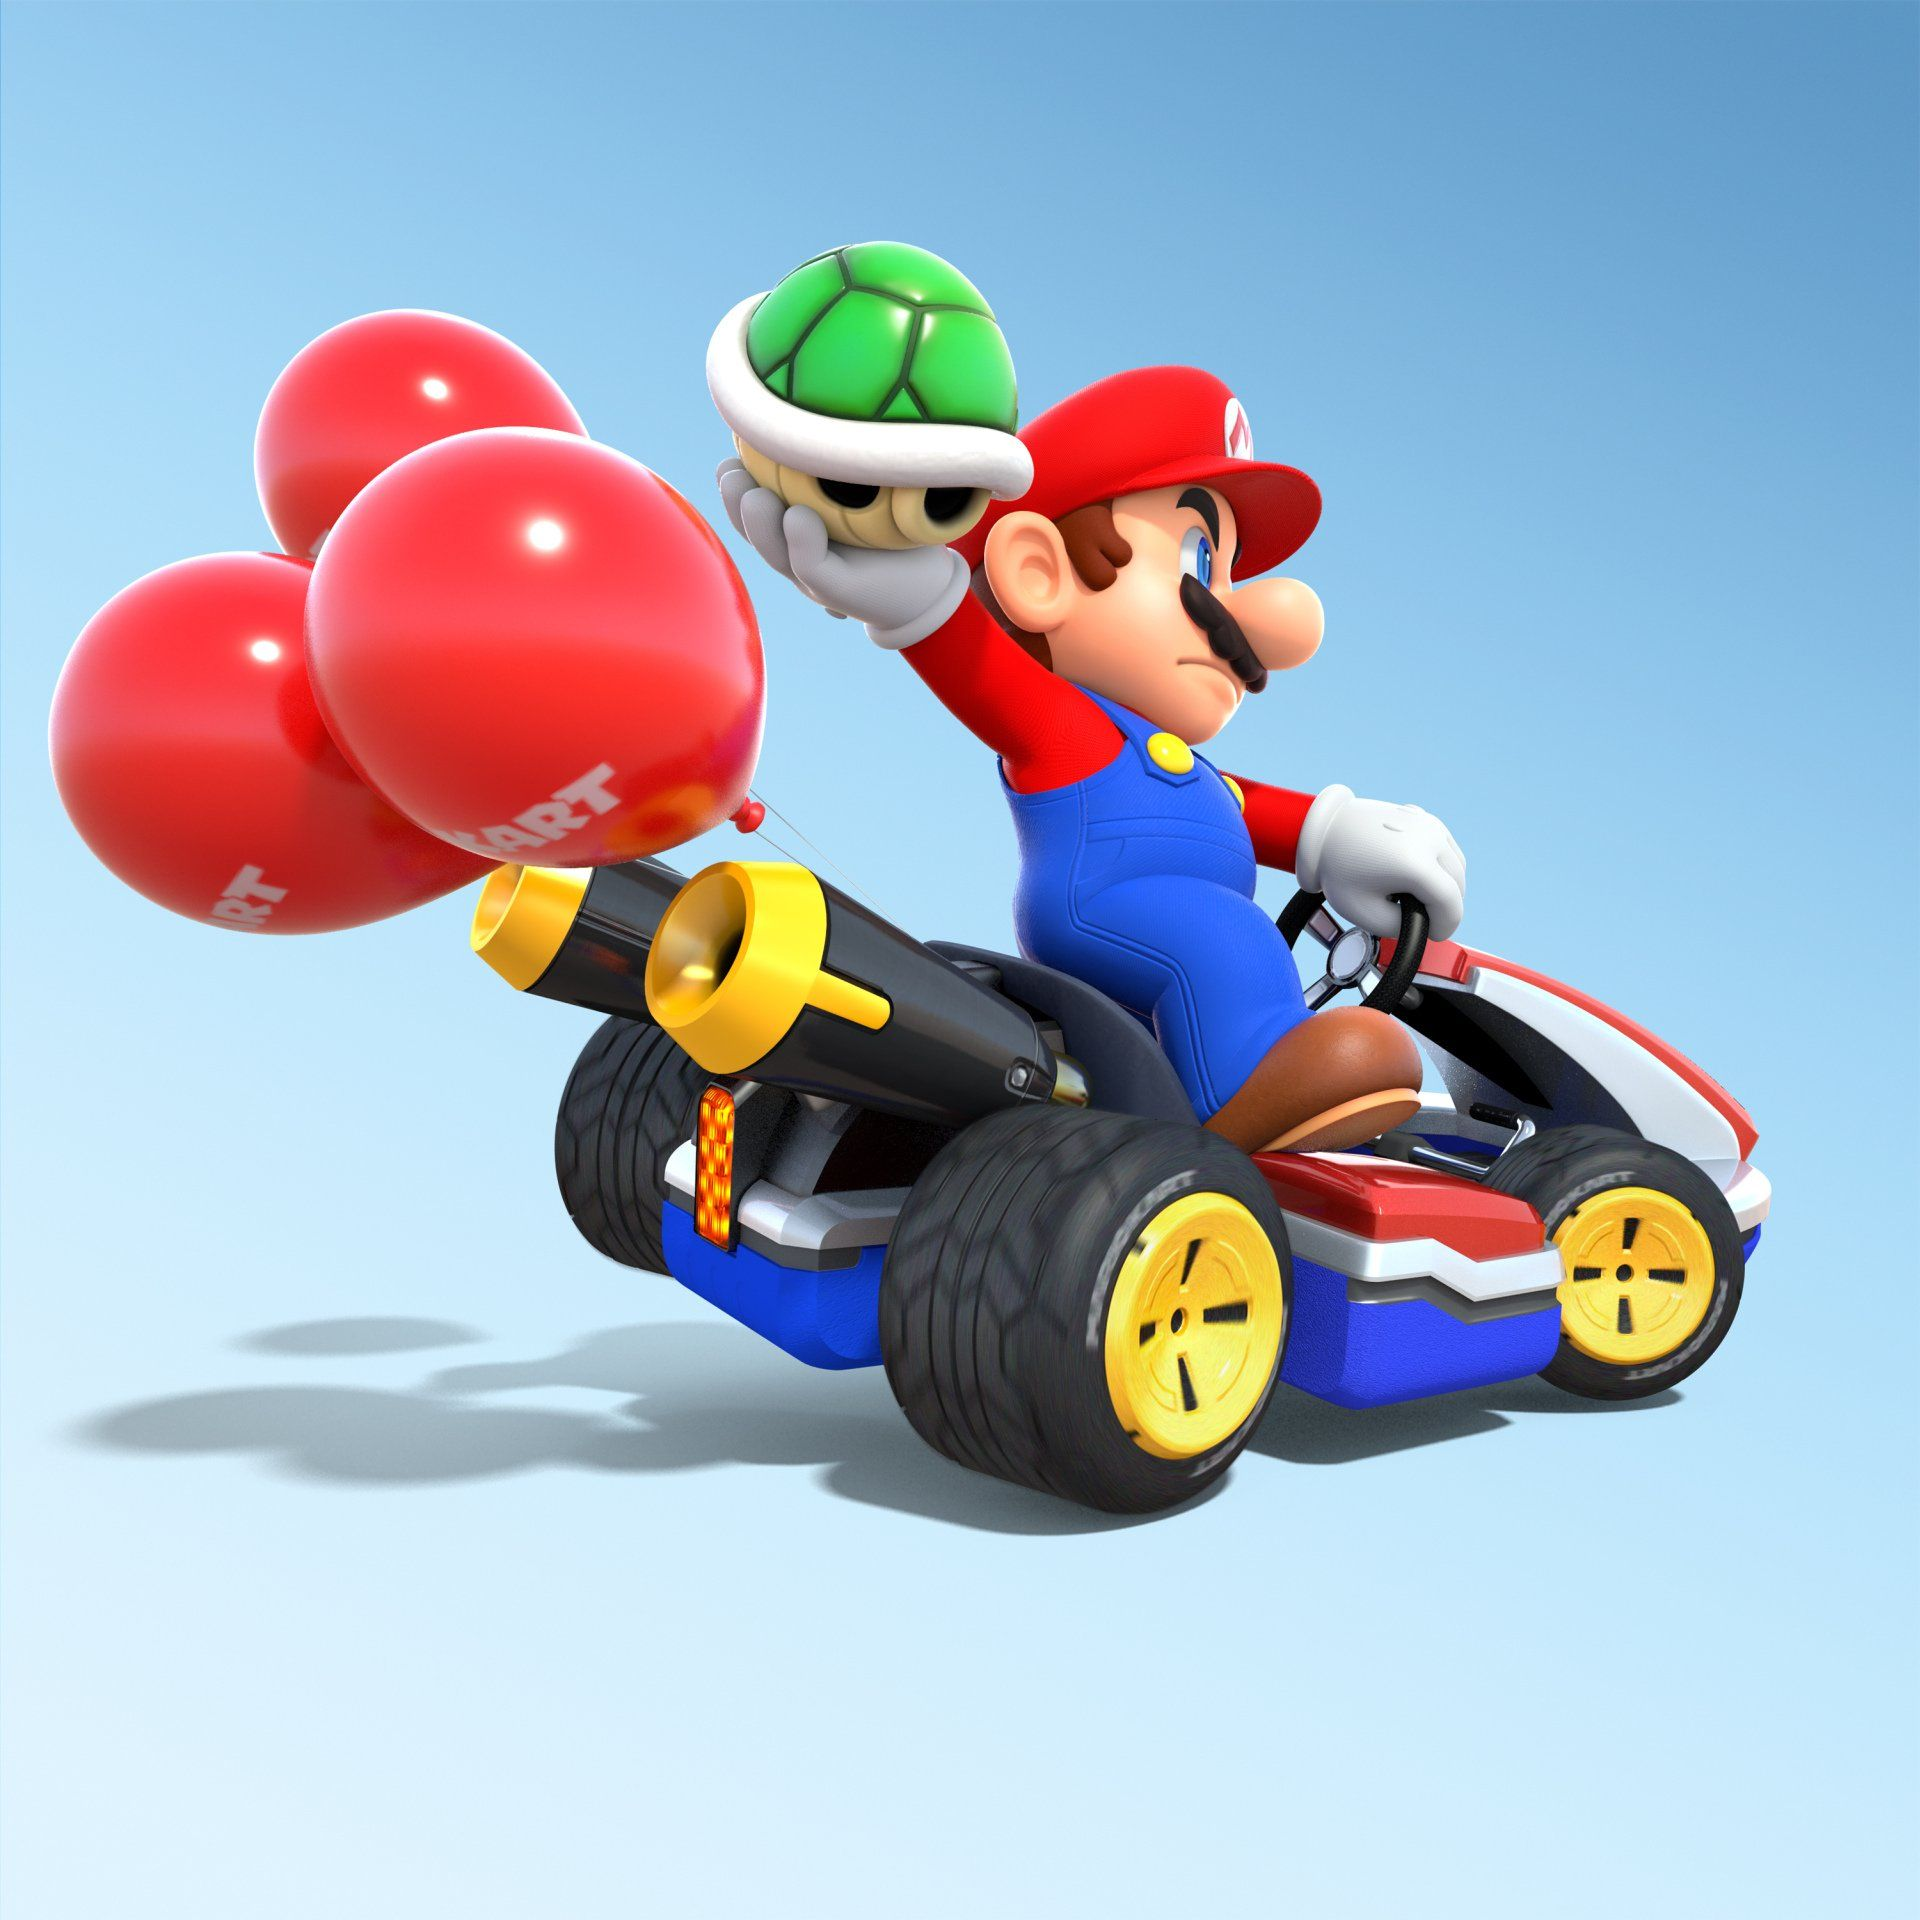 Donkey kong mario kart wii car tuning - Mario Kart 8 Deluxe Nintendo Switch Mariokart8 Wiiu Nitendo Switch